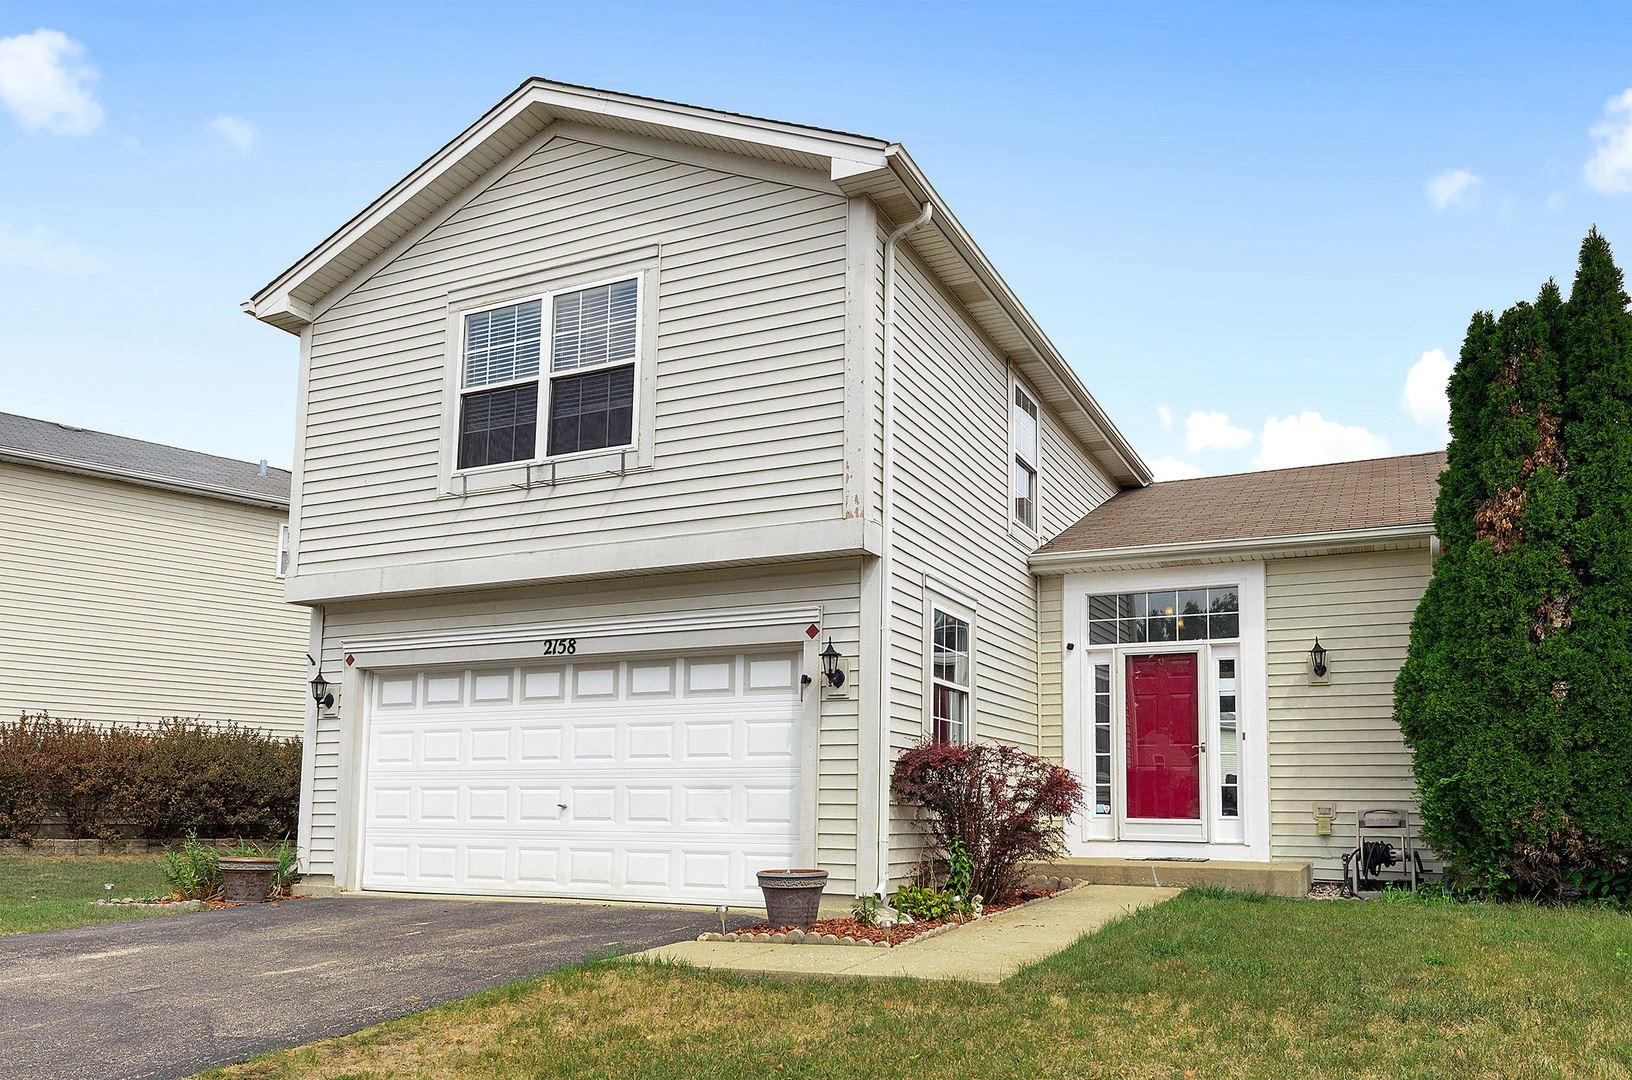 Photo of 2158 Carpenter Avenue, Plainfield, IL 60586 (MLS # 10918356)